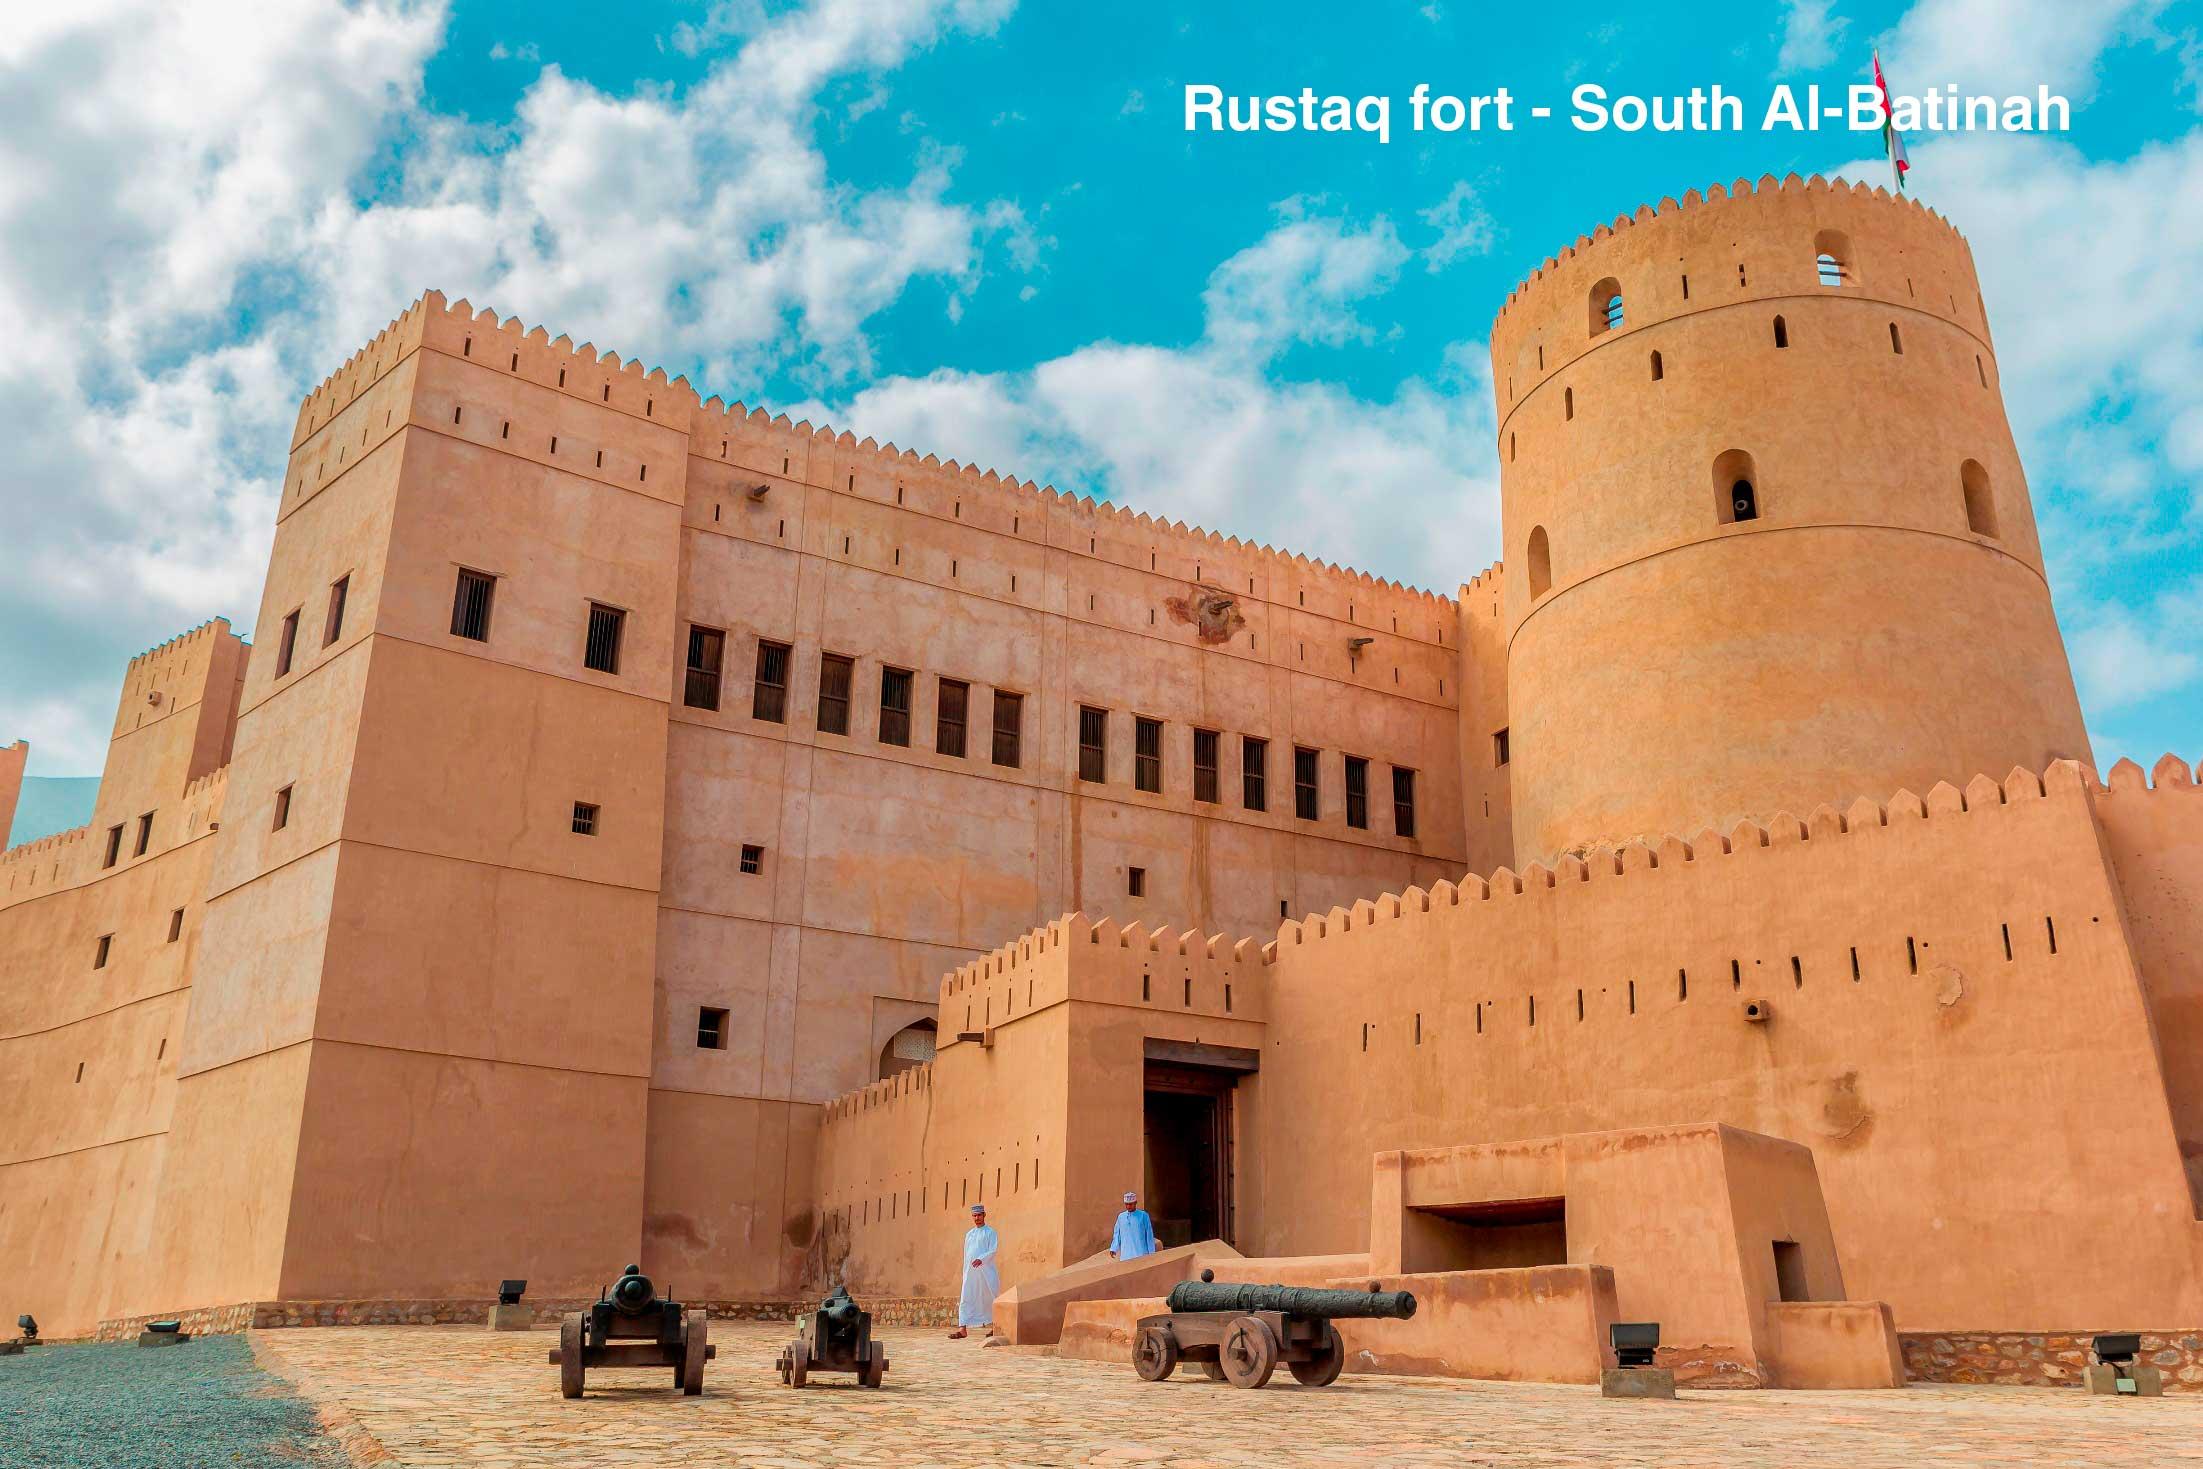 Rustaq-fort---South-Al-Batinah